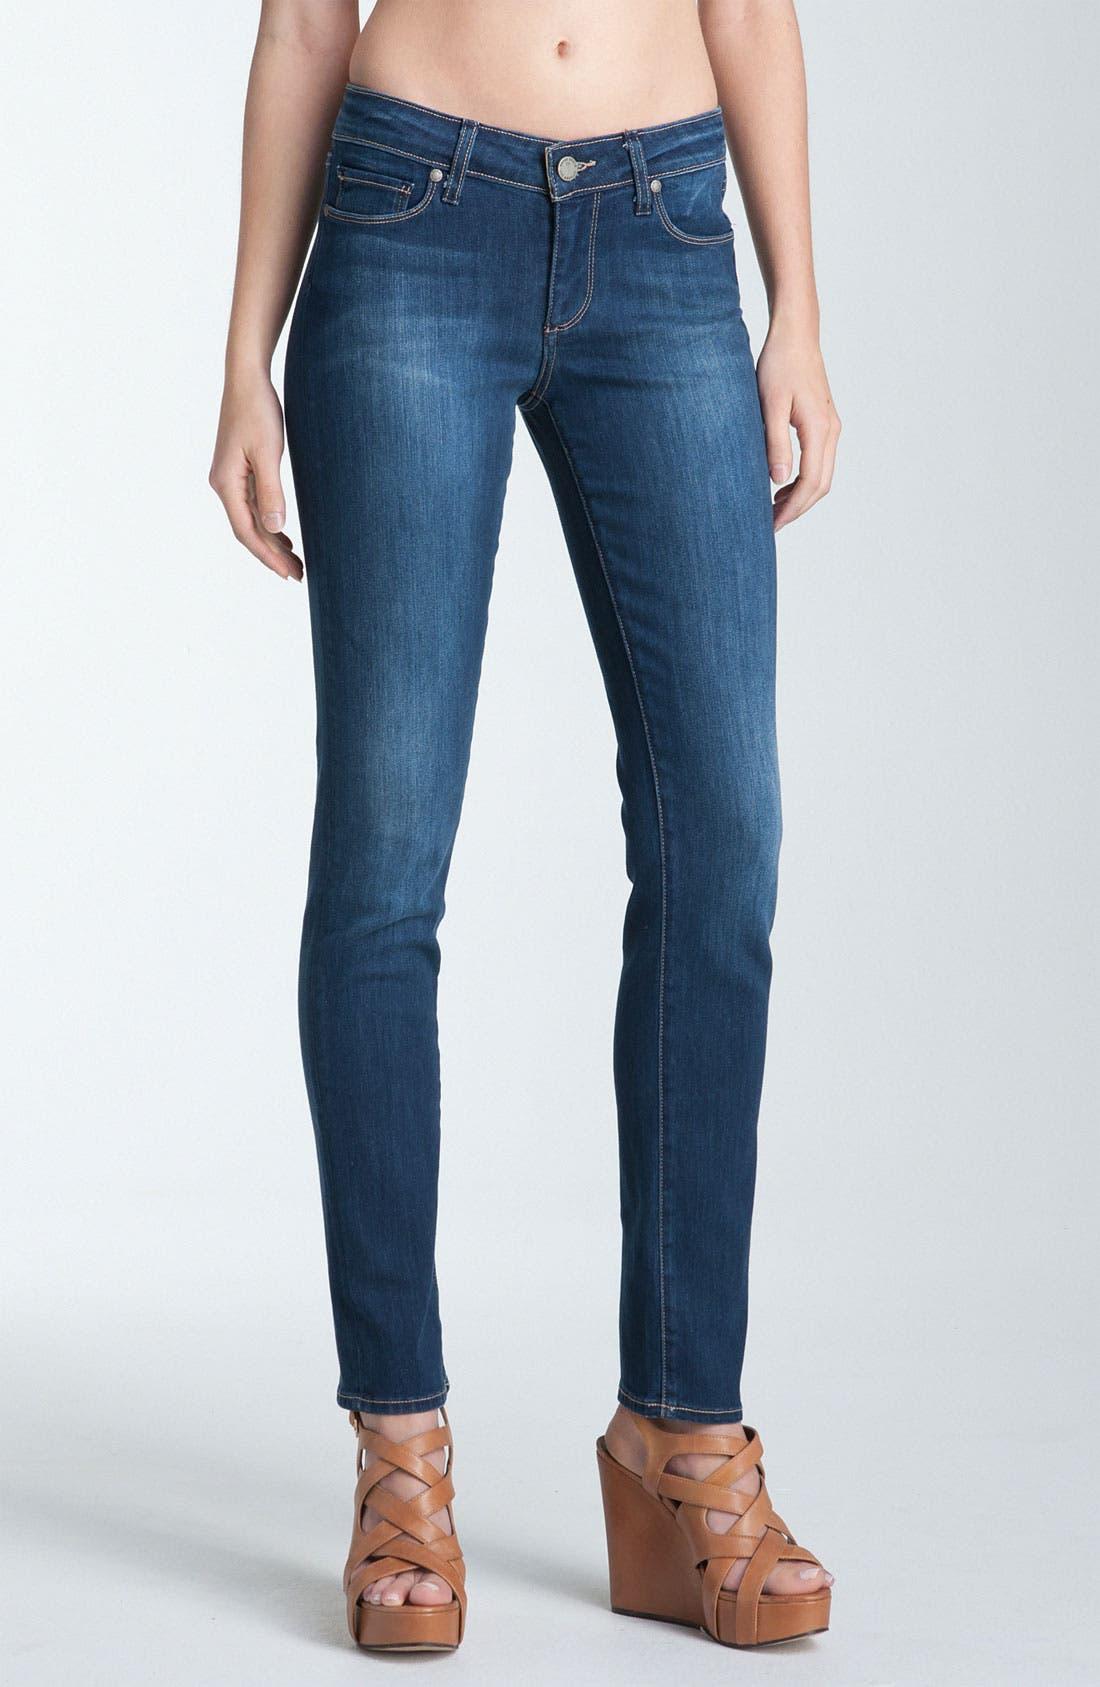 Alternate Image 1 Selected - Paige Denim 'Skyline' Skinny Jeans (Ravine)